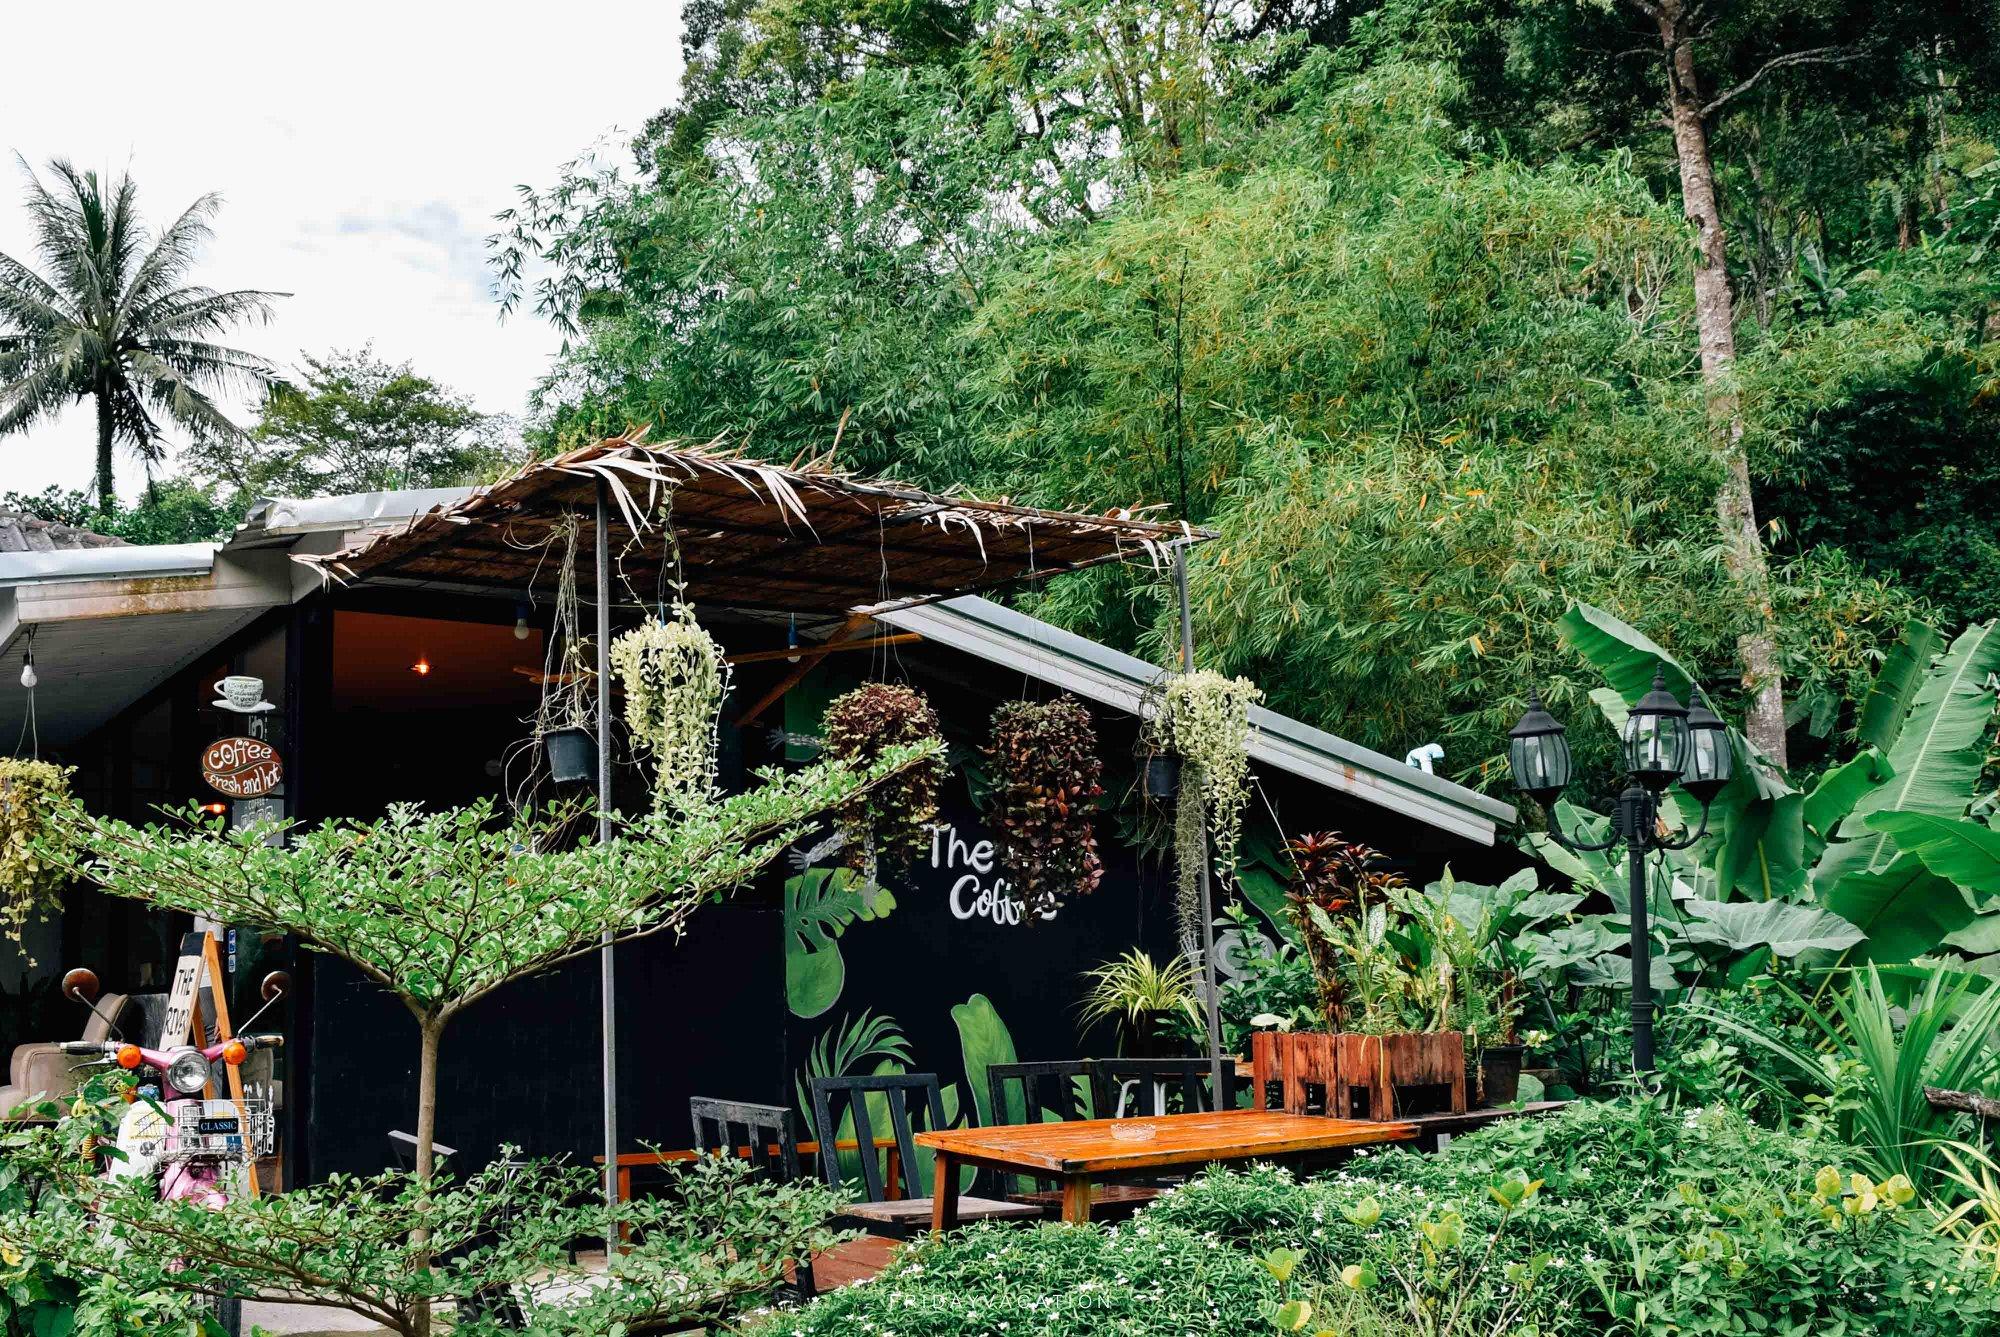 3.-The-river-coffee-บรรยากาศคือดีมากครับ-ร้านกาแฟสวยๆริมลำธาร-ซึ่งเป็นลำธารเล็กๆ-น้ำไม่เยอะ- แต่น้ำในลำธารเย็นสบายมากๆ-นั่งแช่น้ำจิบกาแฟ-หรือกินเค้กแบบชิลๆได้สบายๆเลยครับ- แถมร้านข้างๆก็เป็นร้านอาหารอีสานรสชาติอร่อยด้วย-สามารถสั่งมาทานด้วยกันได้ครับ รีวิวตัวเต็ม- คลิกที่นี่ ภูเก็ต,สถานที่ท่องเที่ยว,ของกิน,จุดเช็คอิน,ที่เที่ยว,จุดถ่ายรูป